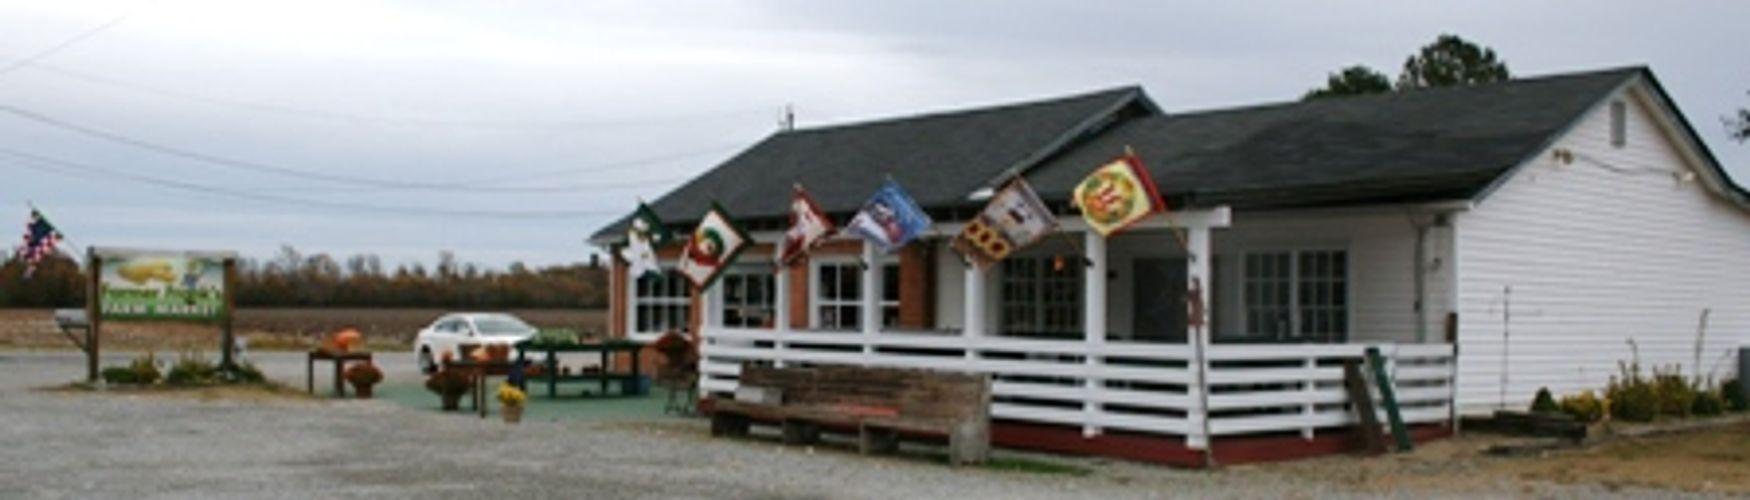 Farmer Frank's Farm Market - Restaurant, Bakery